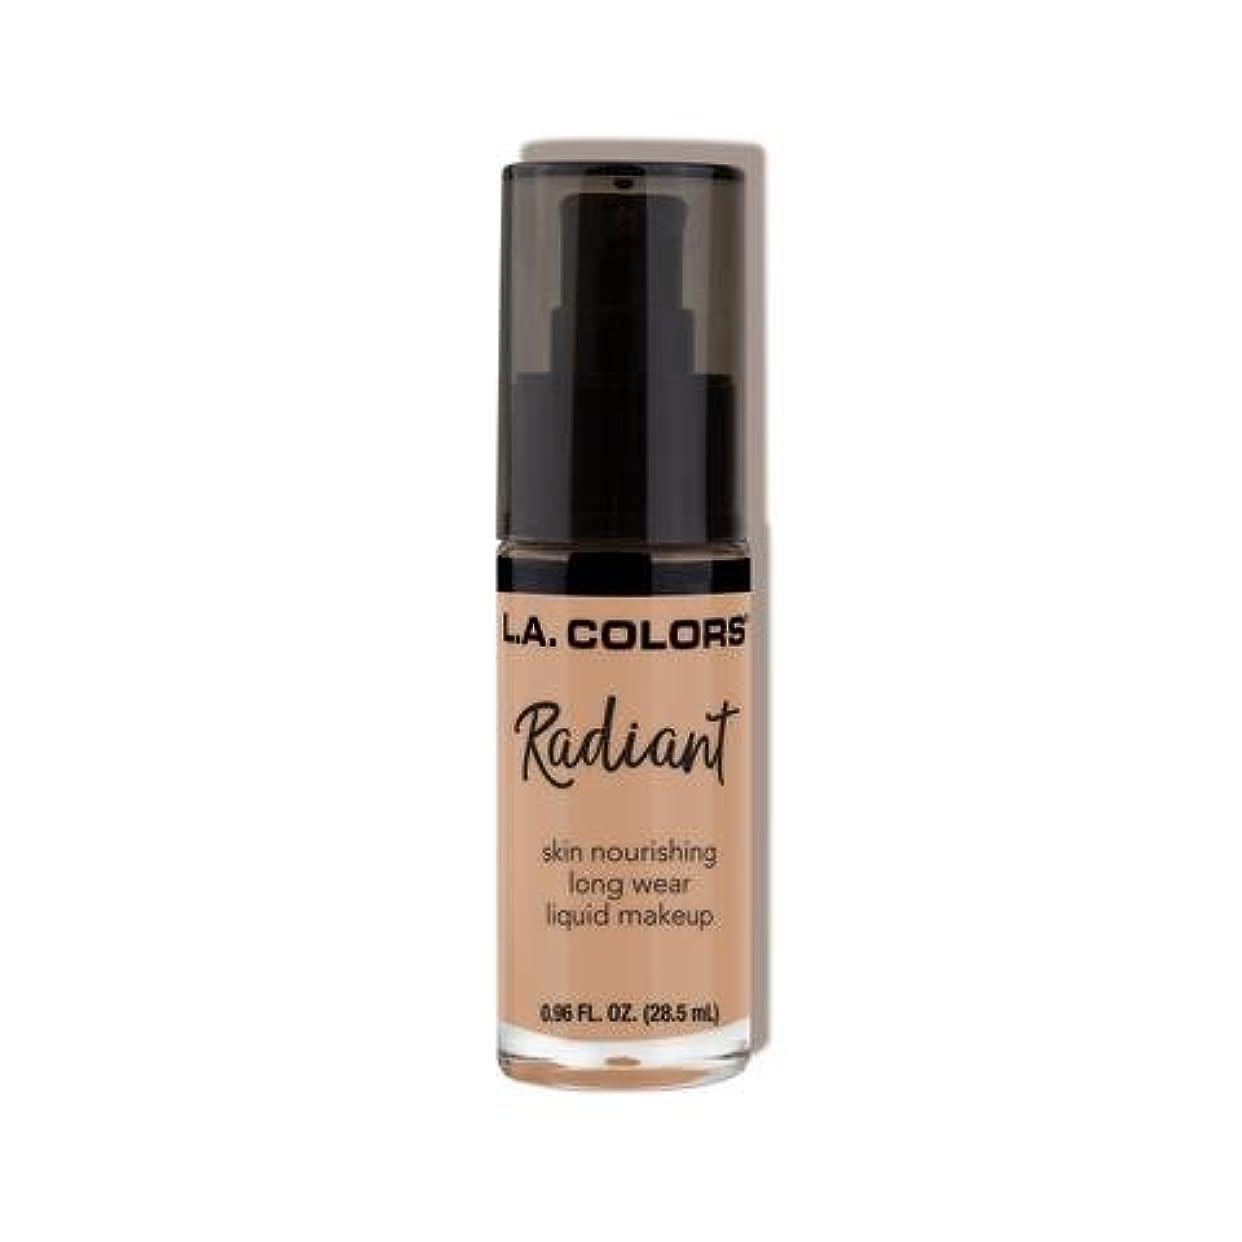 数達成確立(3 Pack) L.A. COLORS Radiant Liquid Makeup - Medium Tan (並行輸入品)